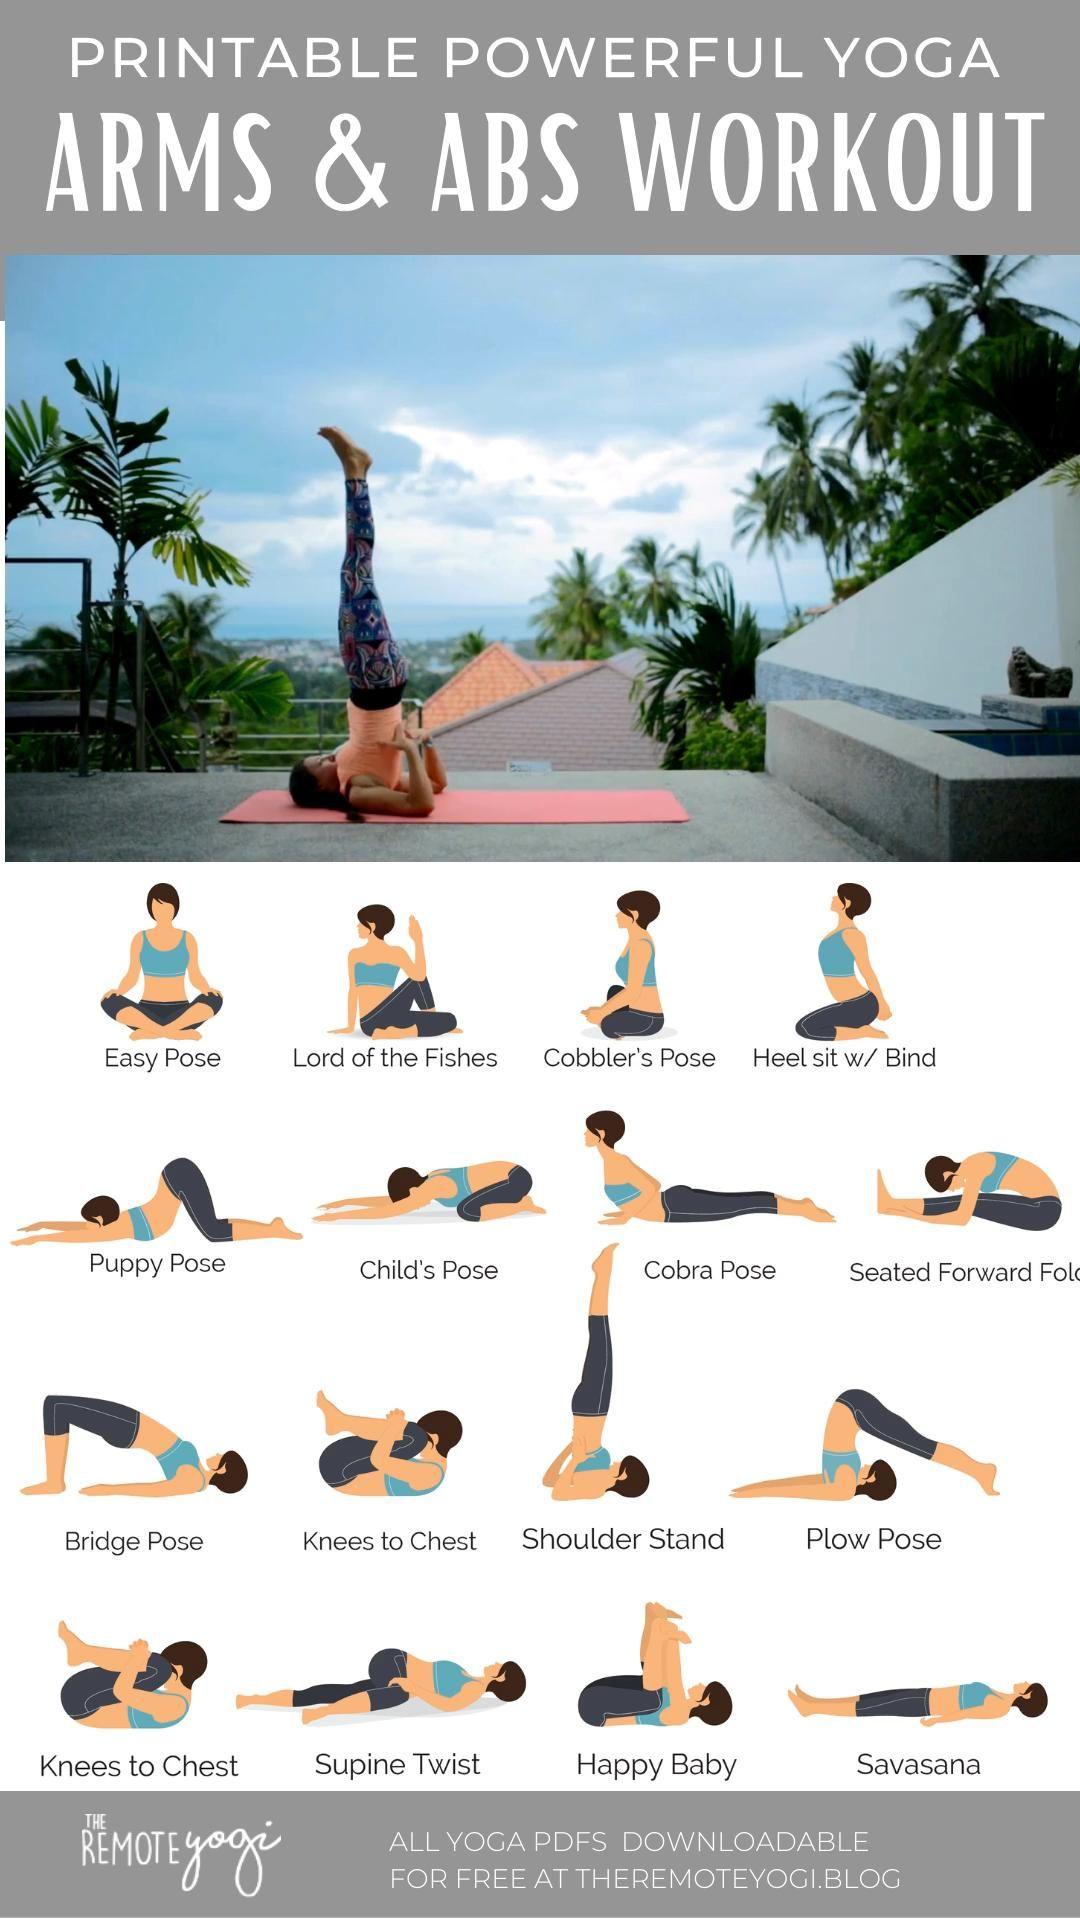 Yoga for Strong Abs & Arms – Free Printable PDF